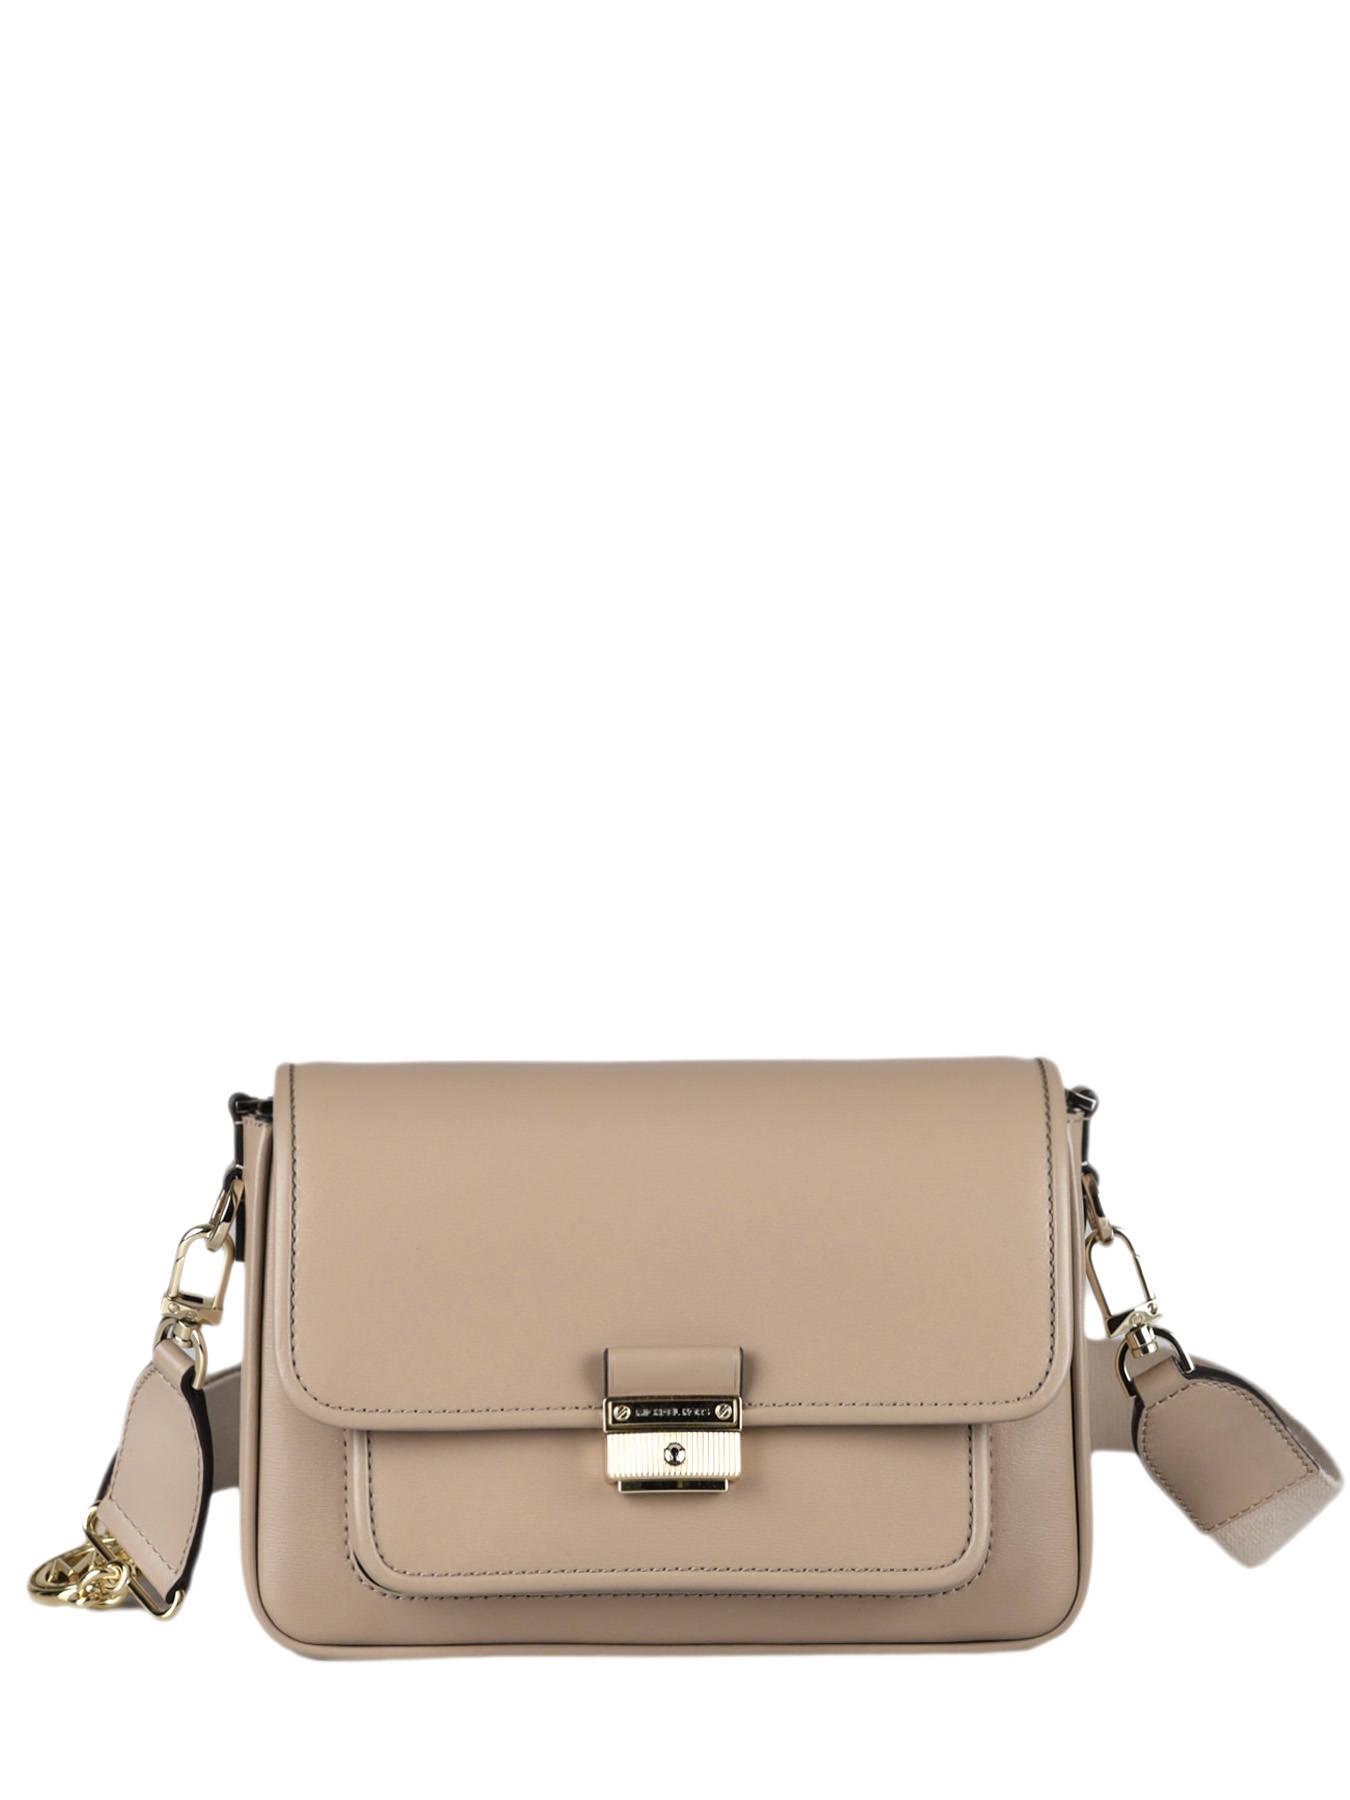 Shoulder bag Bradshaw leather MICHAEL KORS